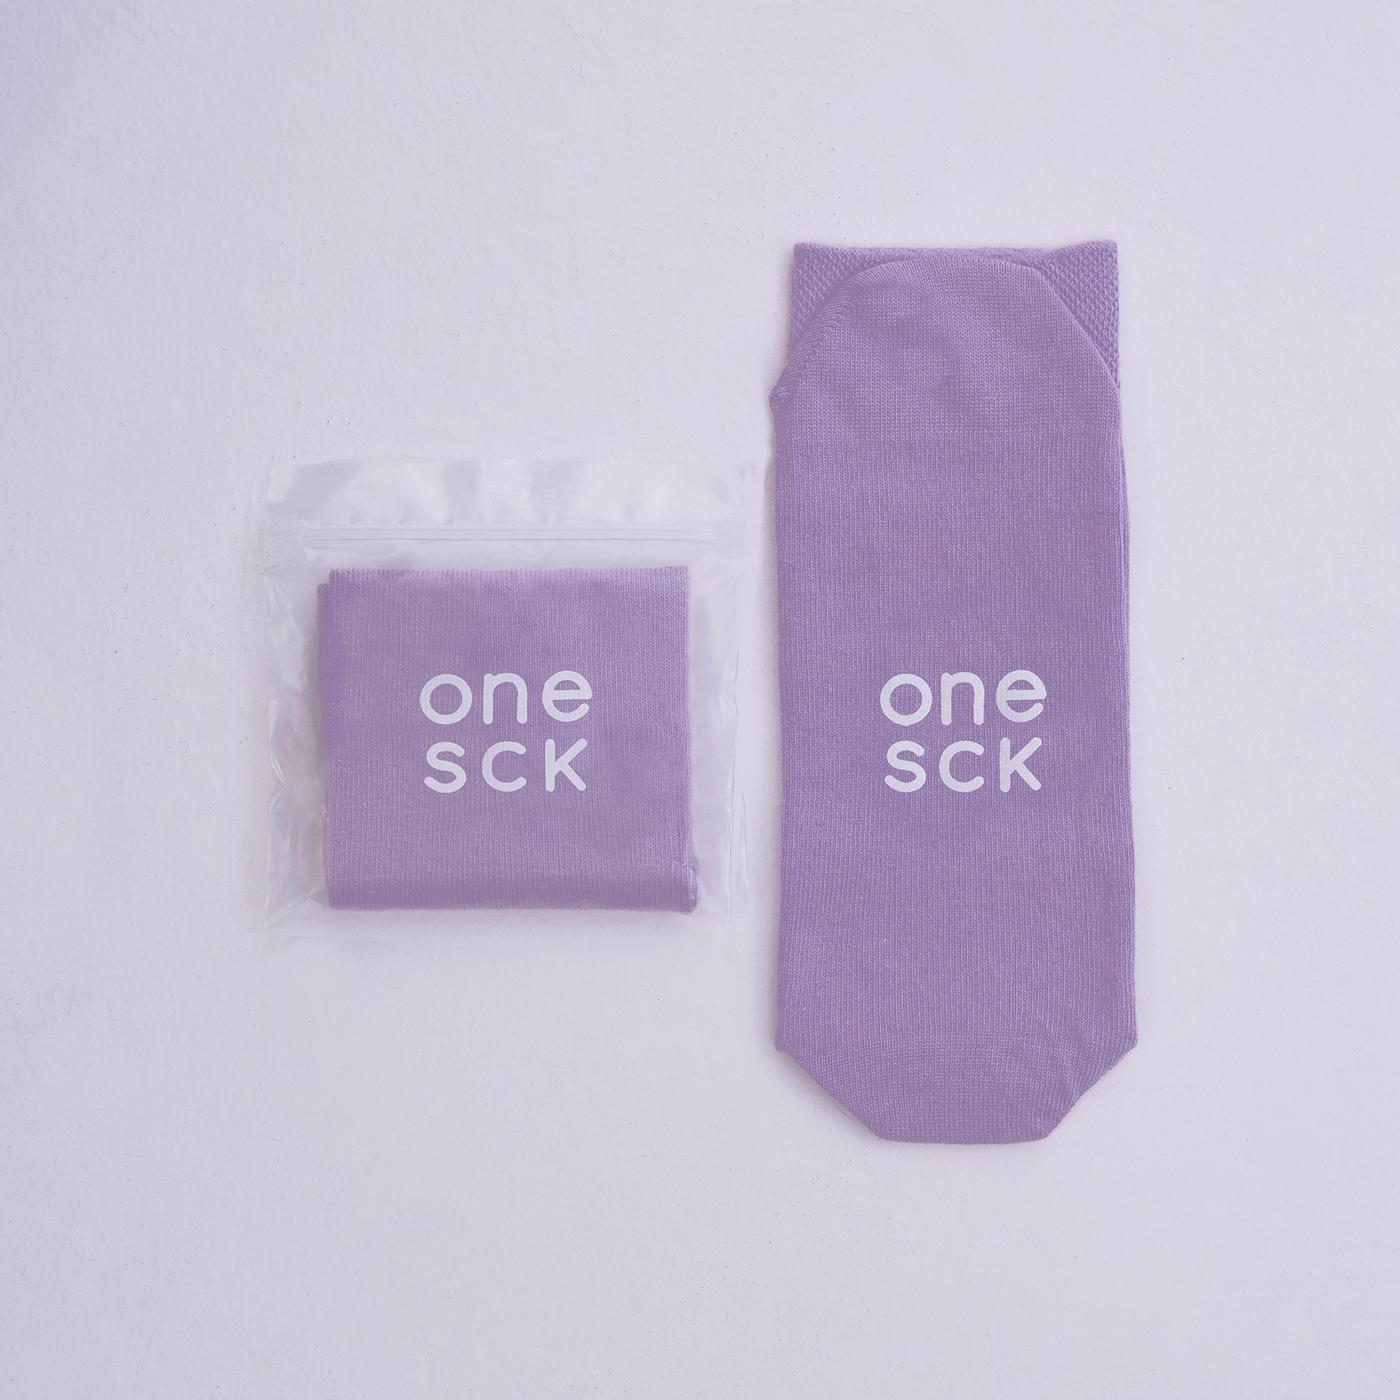 ONESCK Orchid Purple One Unisex Mor Çorap